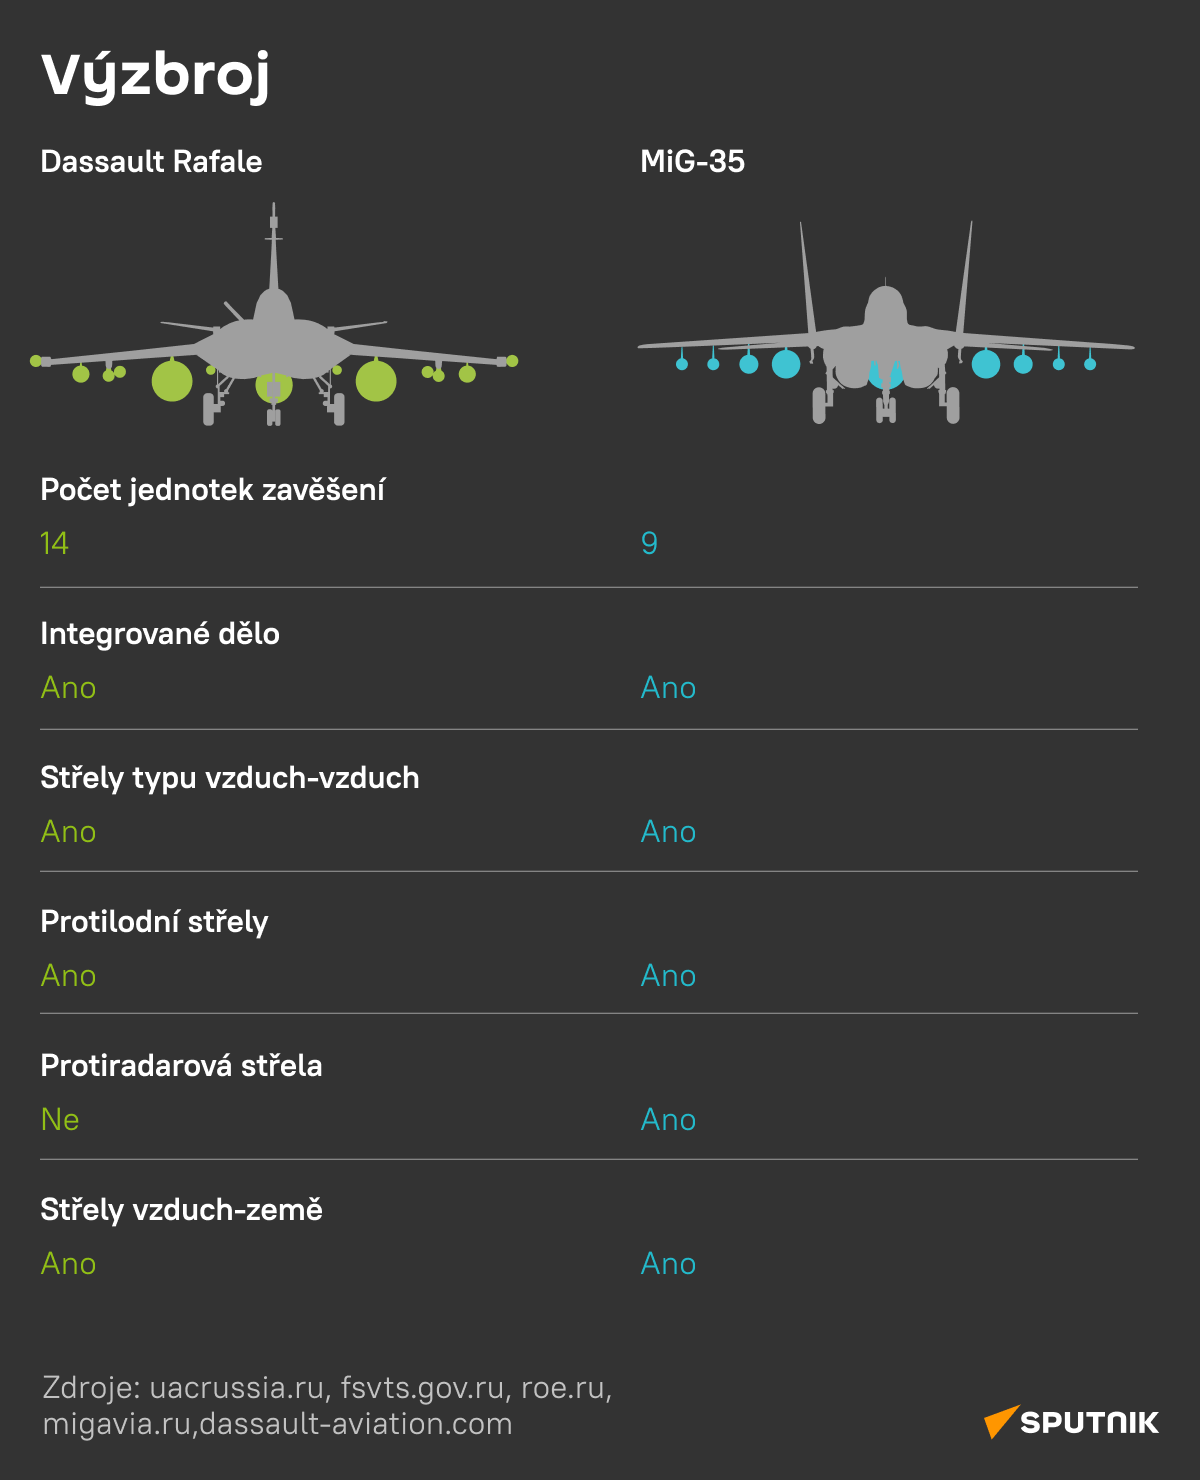 Dassault Rafale versus MiG-35: Výzbroj - Sputnik Česká republika